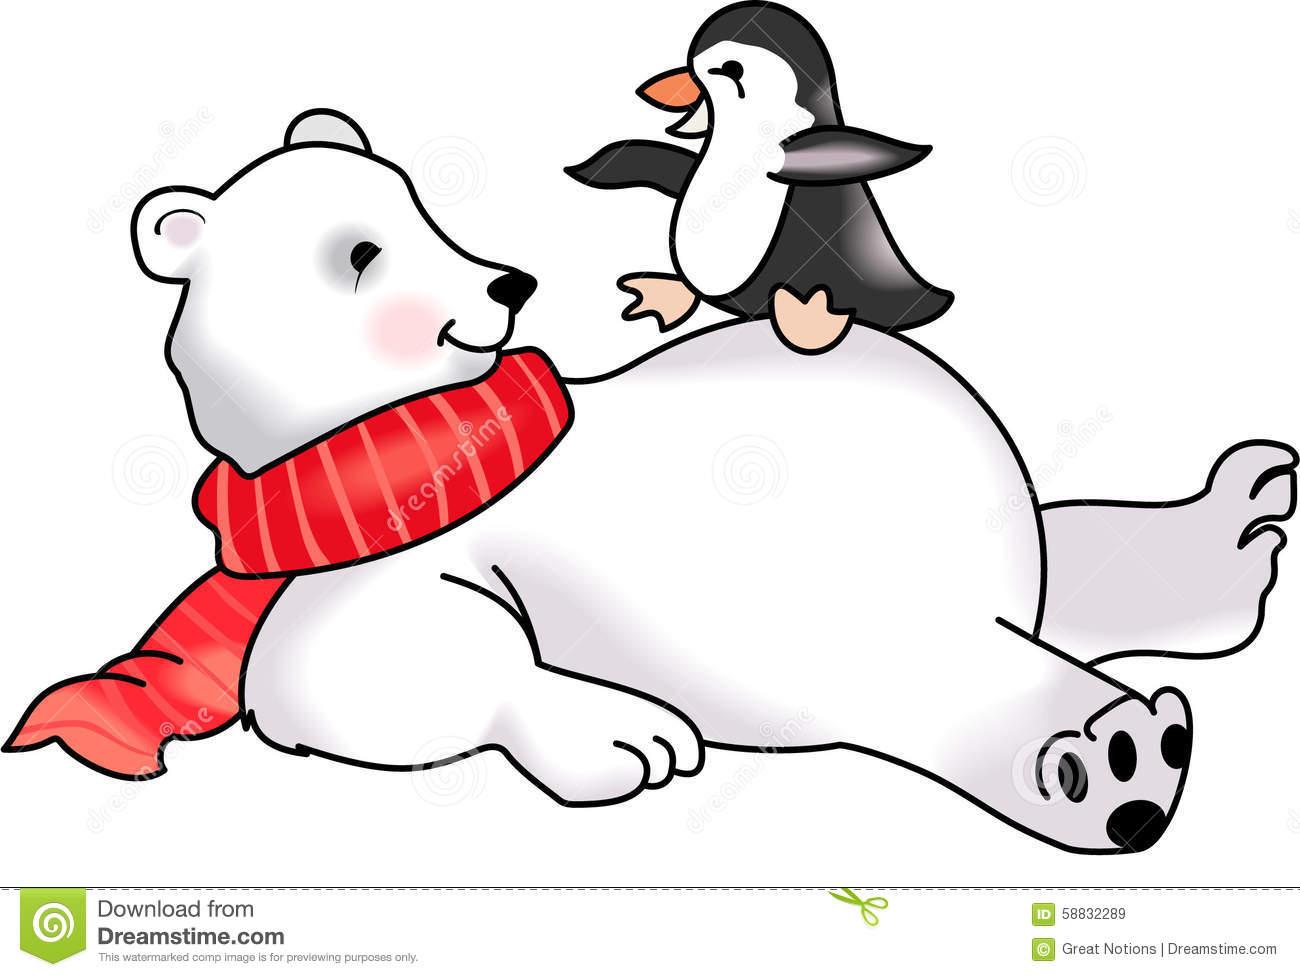 vector royalty free stock Cute cartoon free download. Polar bear and penguin clipart